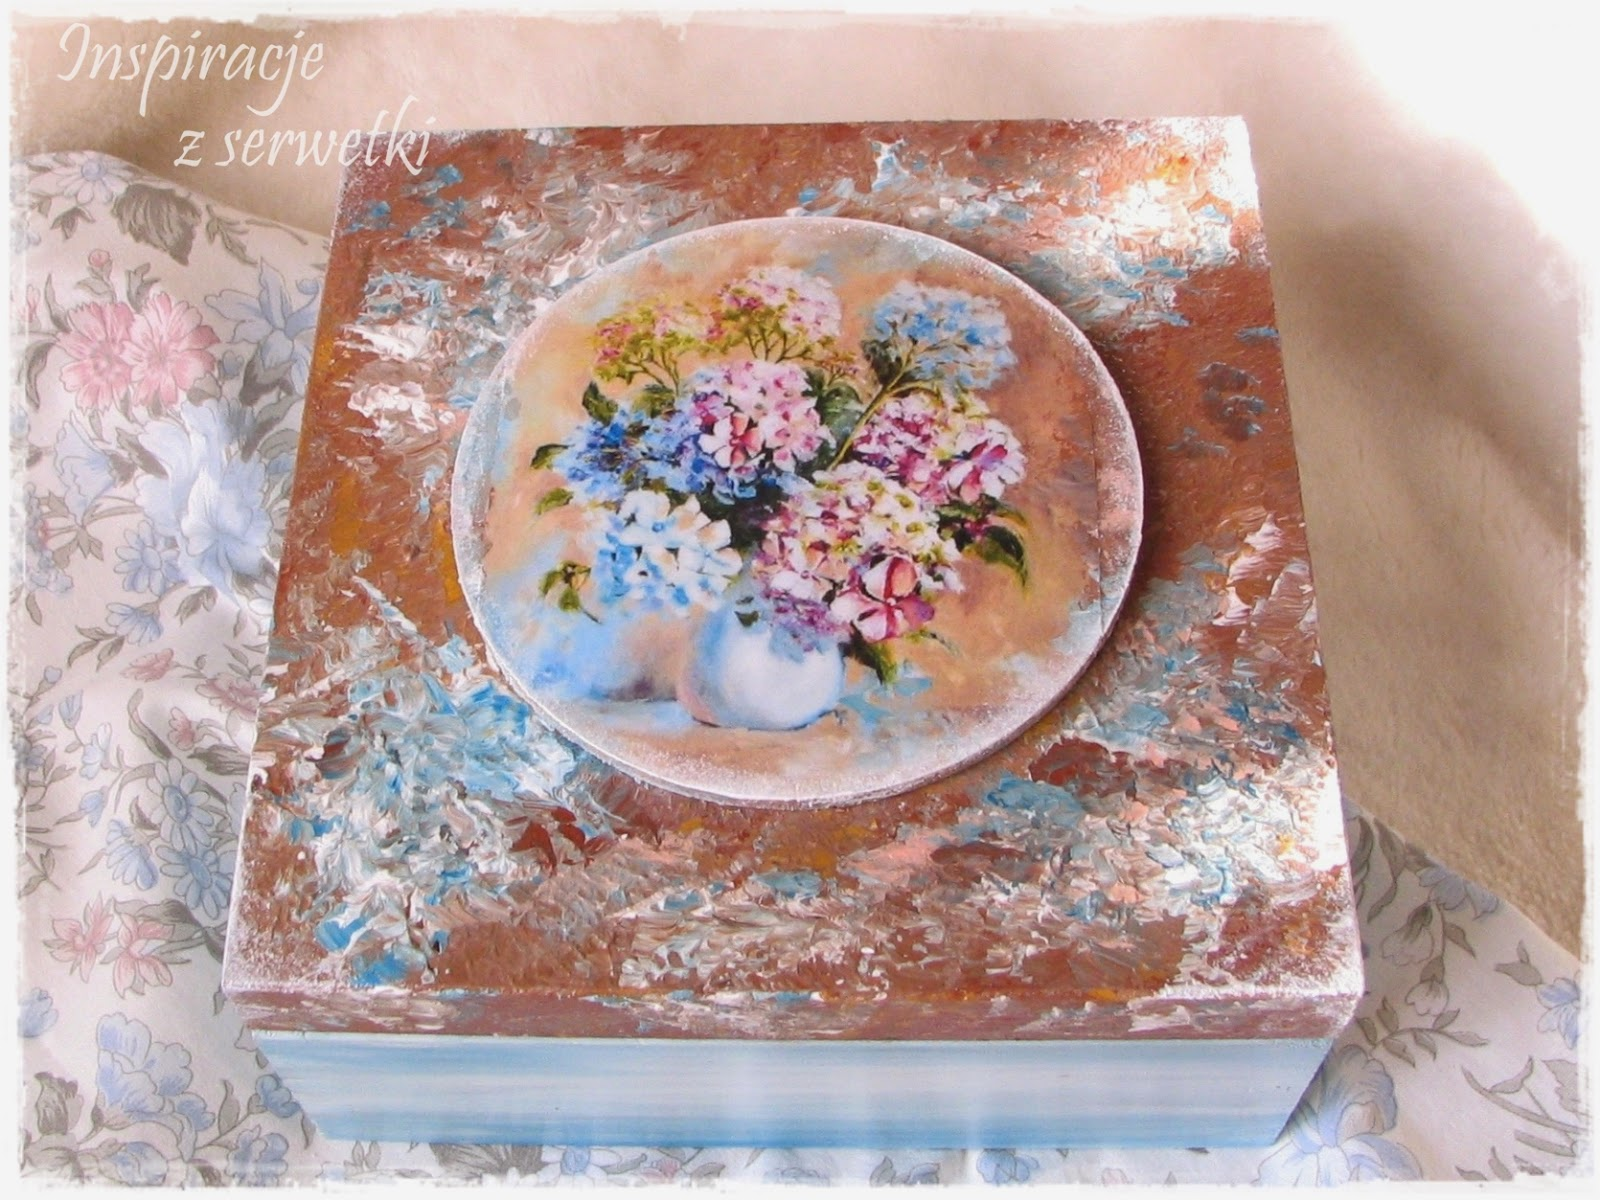 http://blog.paperconcept.pl/2015/02/blekity-hortensji/